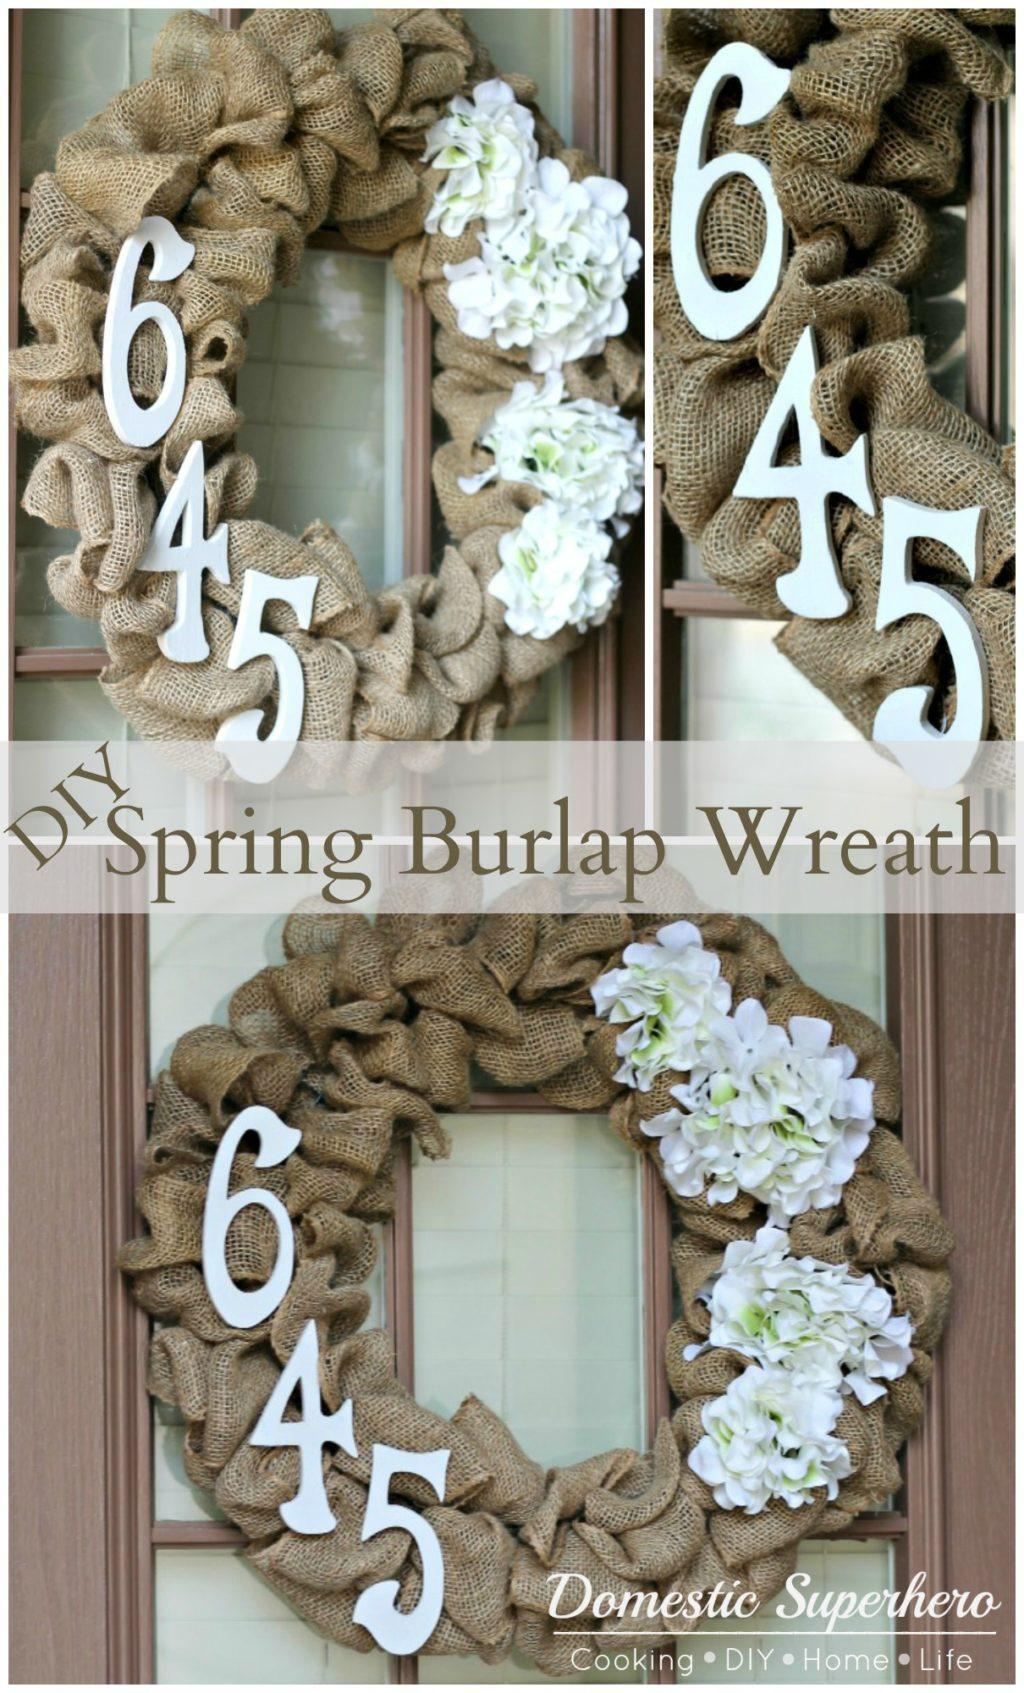 Diy spring burlap wreath domestic superhero for How to make door wreaths for spring